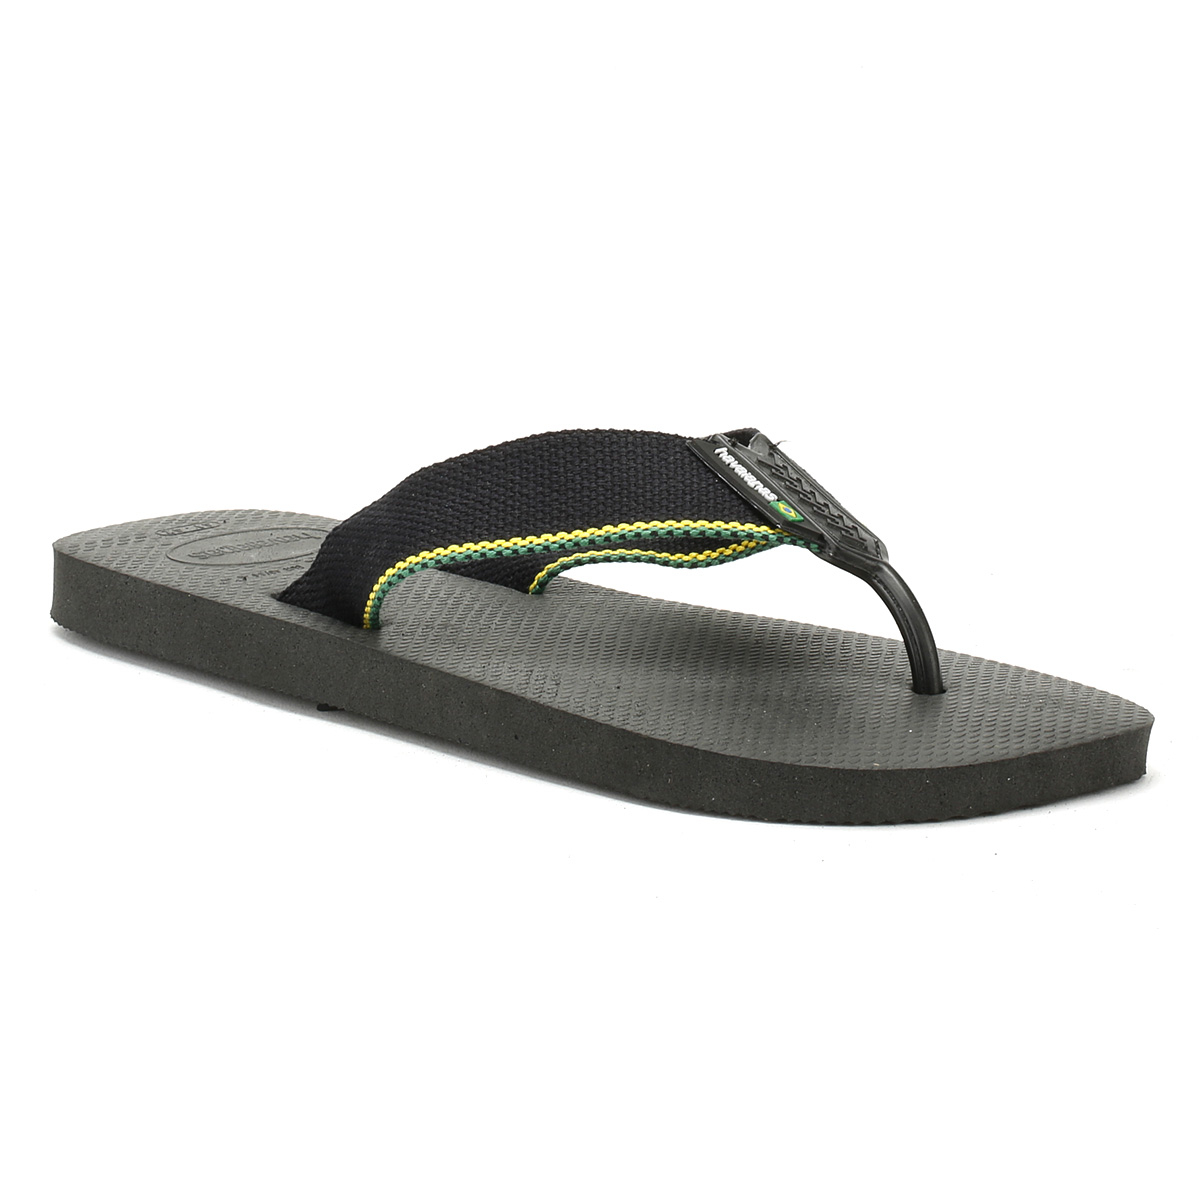 29a8fba9ec23 Havaianas Mens Black Urban Brasil Flip Flops Beach Summer Thong Shoes